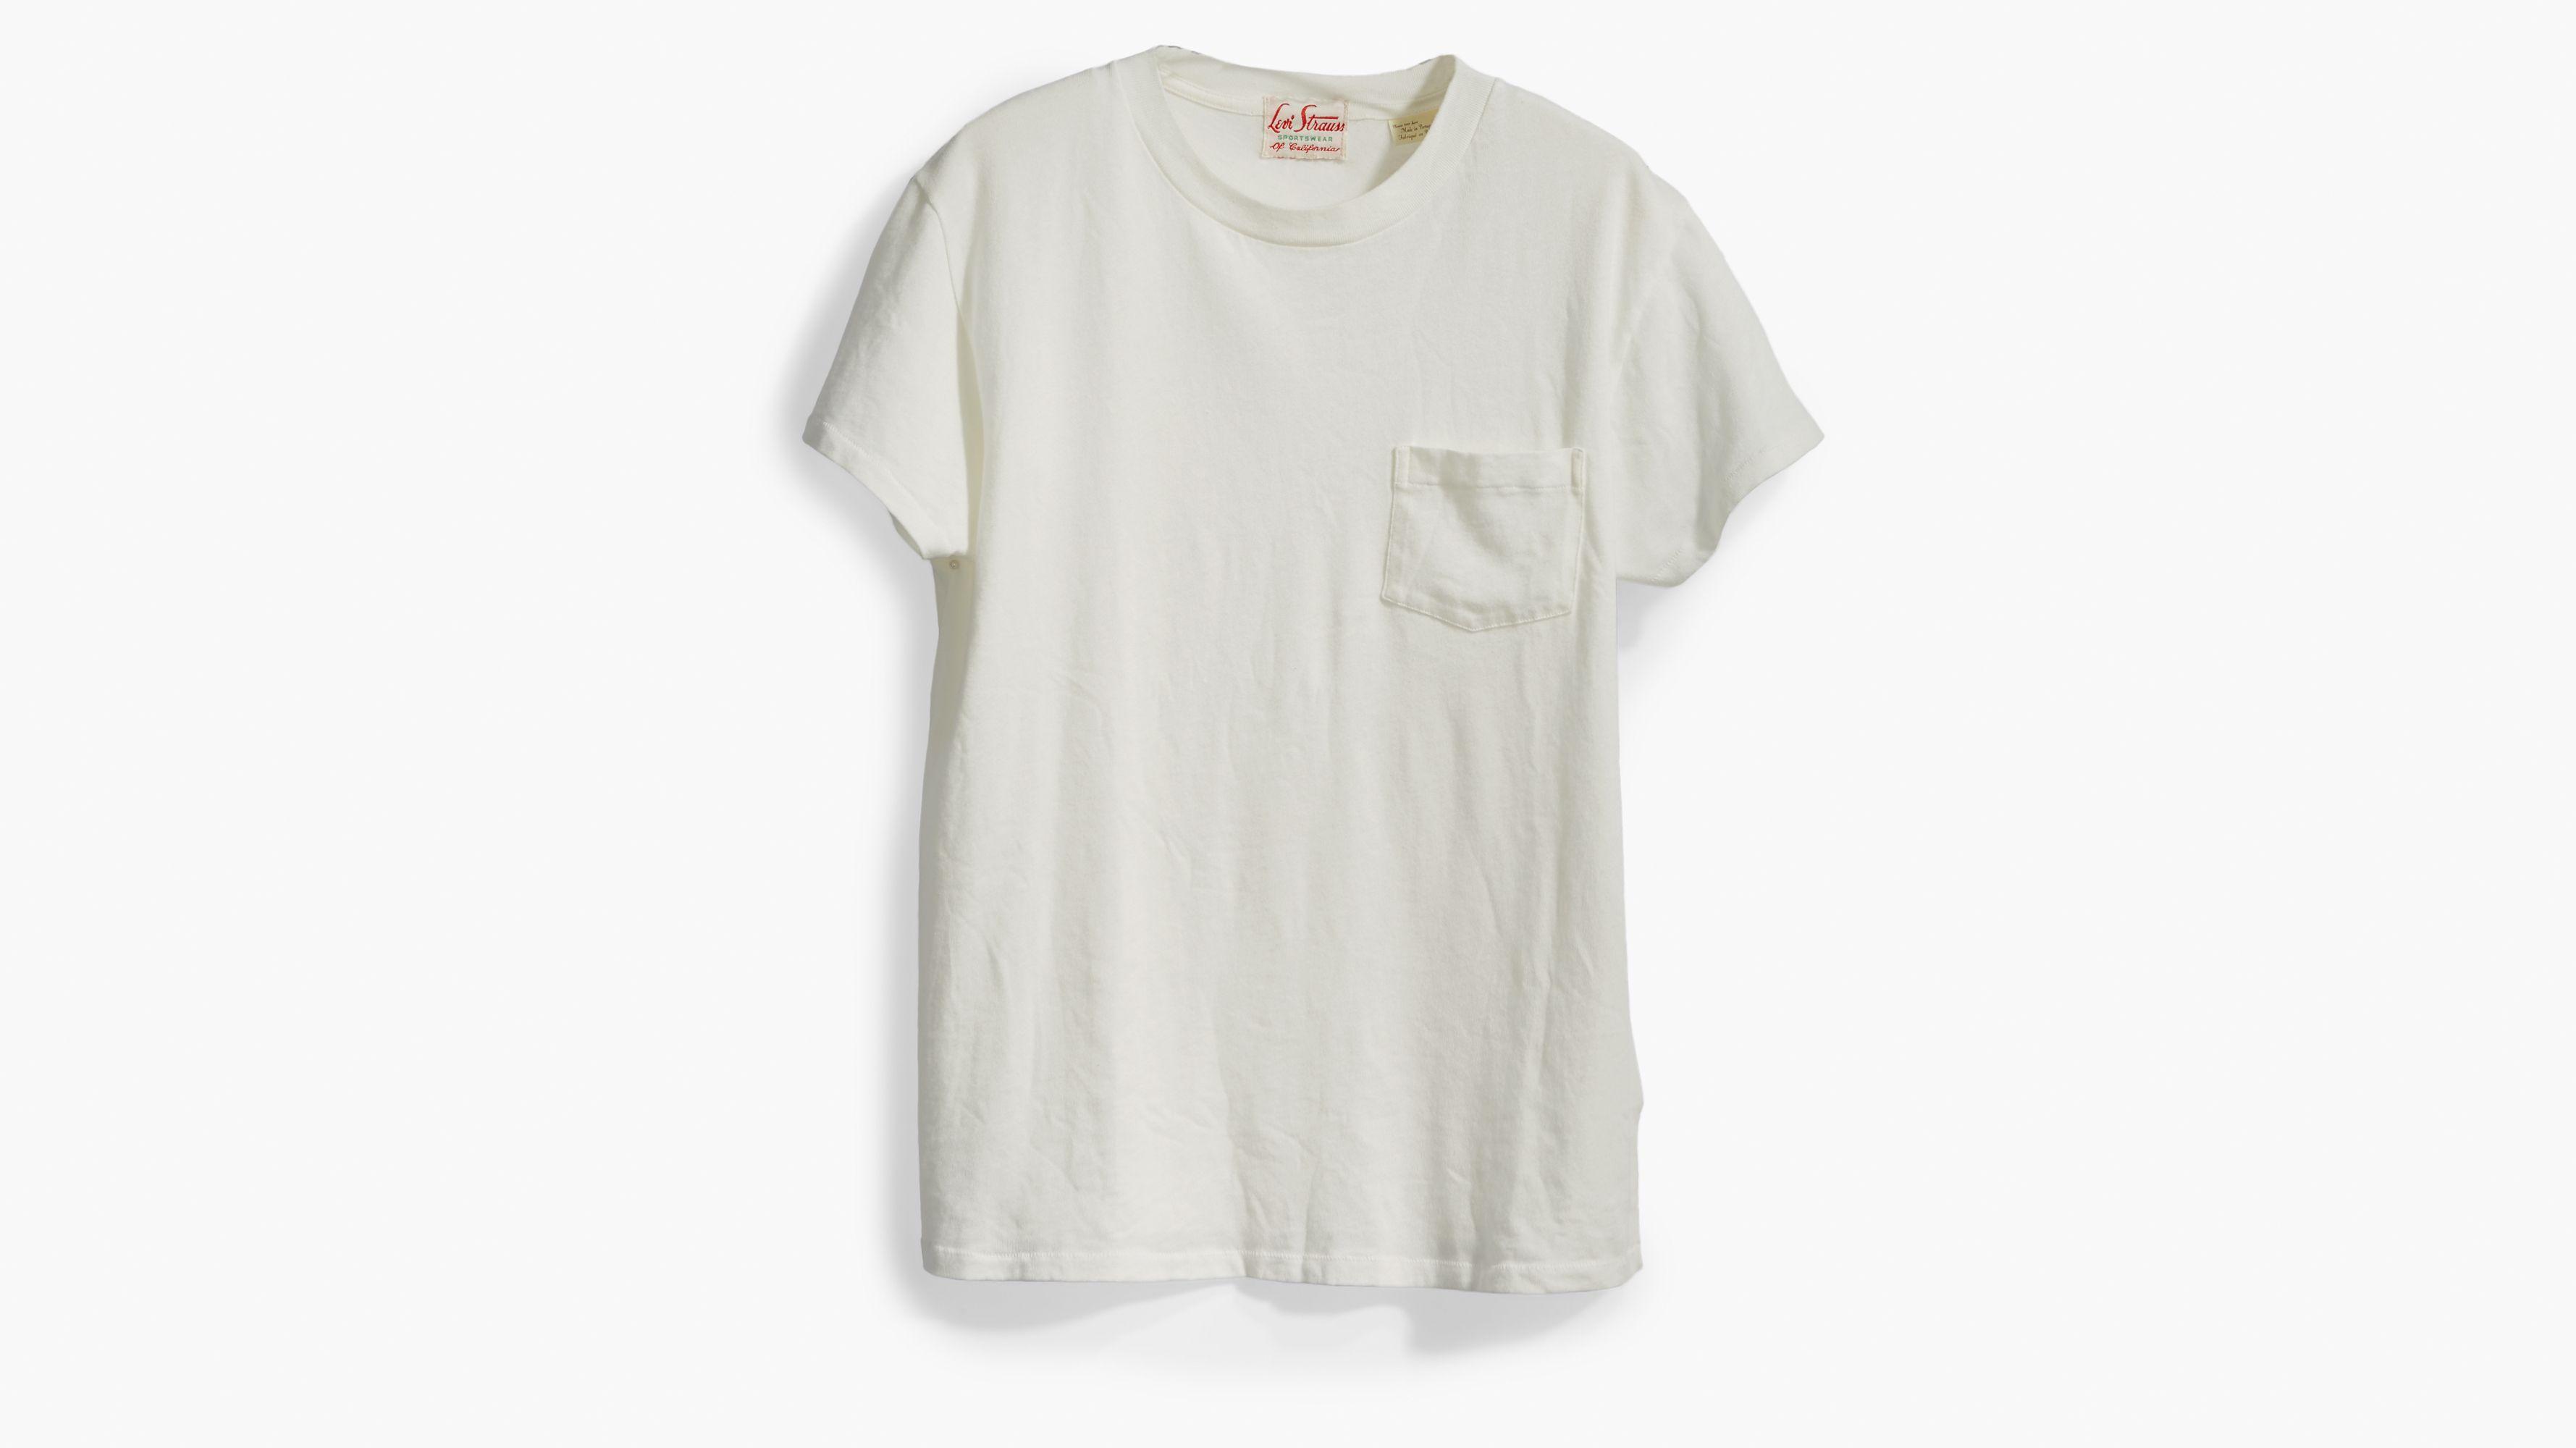 levis retro t shirt